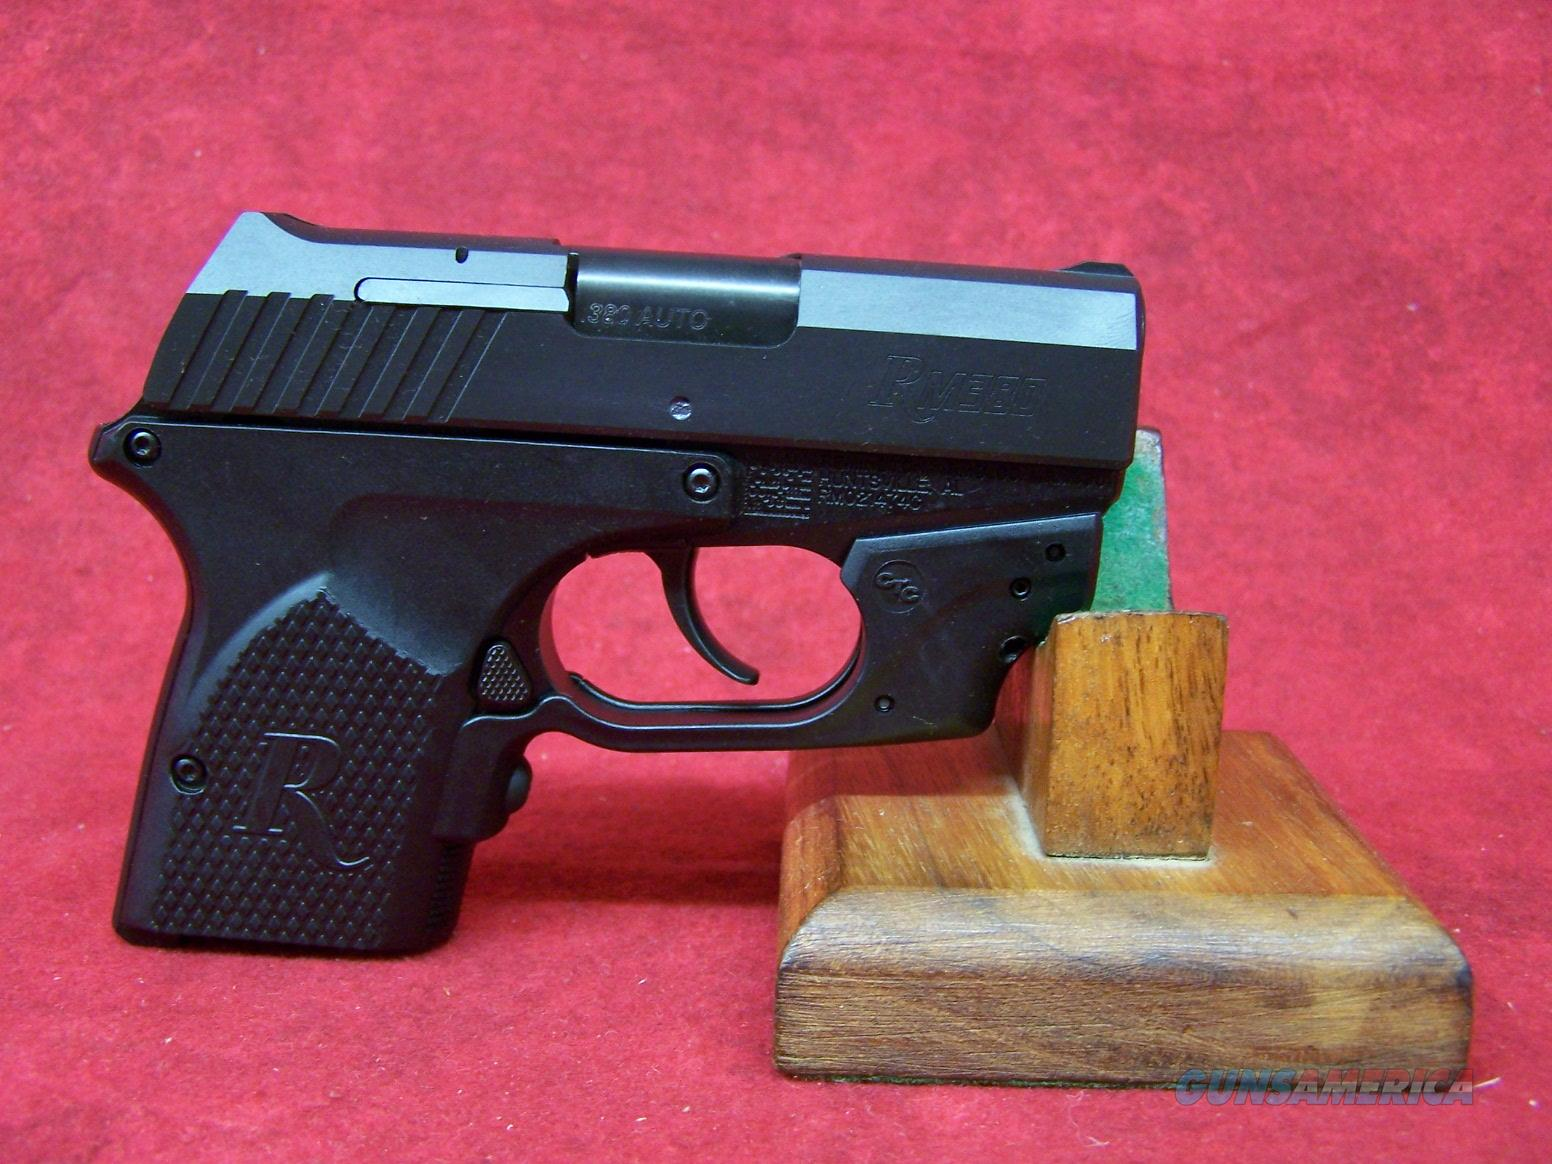 "Remington RM380 With Crimson Trace Grip .380ACP 2.9"" SS Barrel Black Oxide Finish (96462)  Guns > Pistols > Remington Pistols - Modern > RM380"